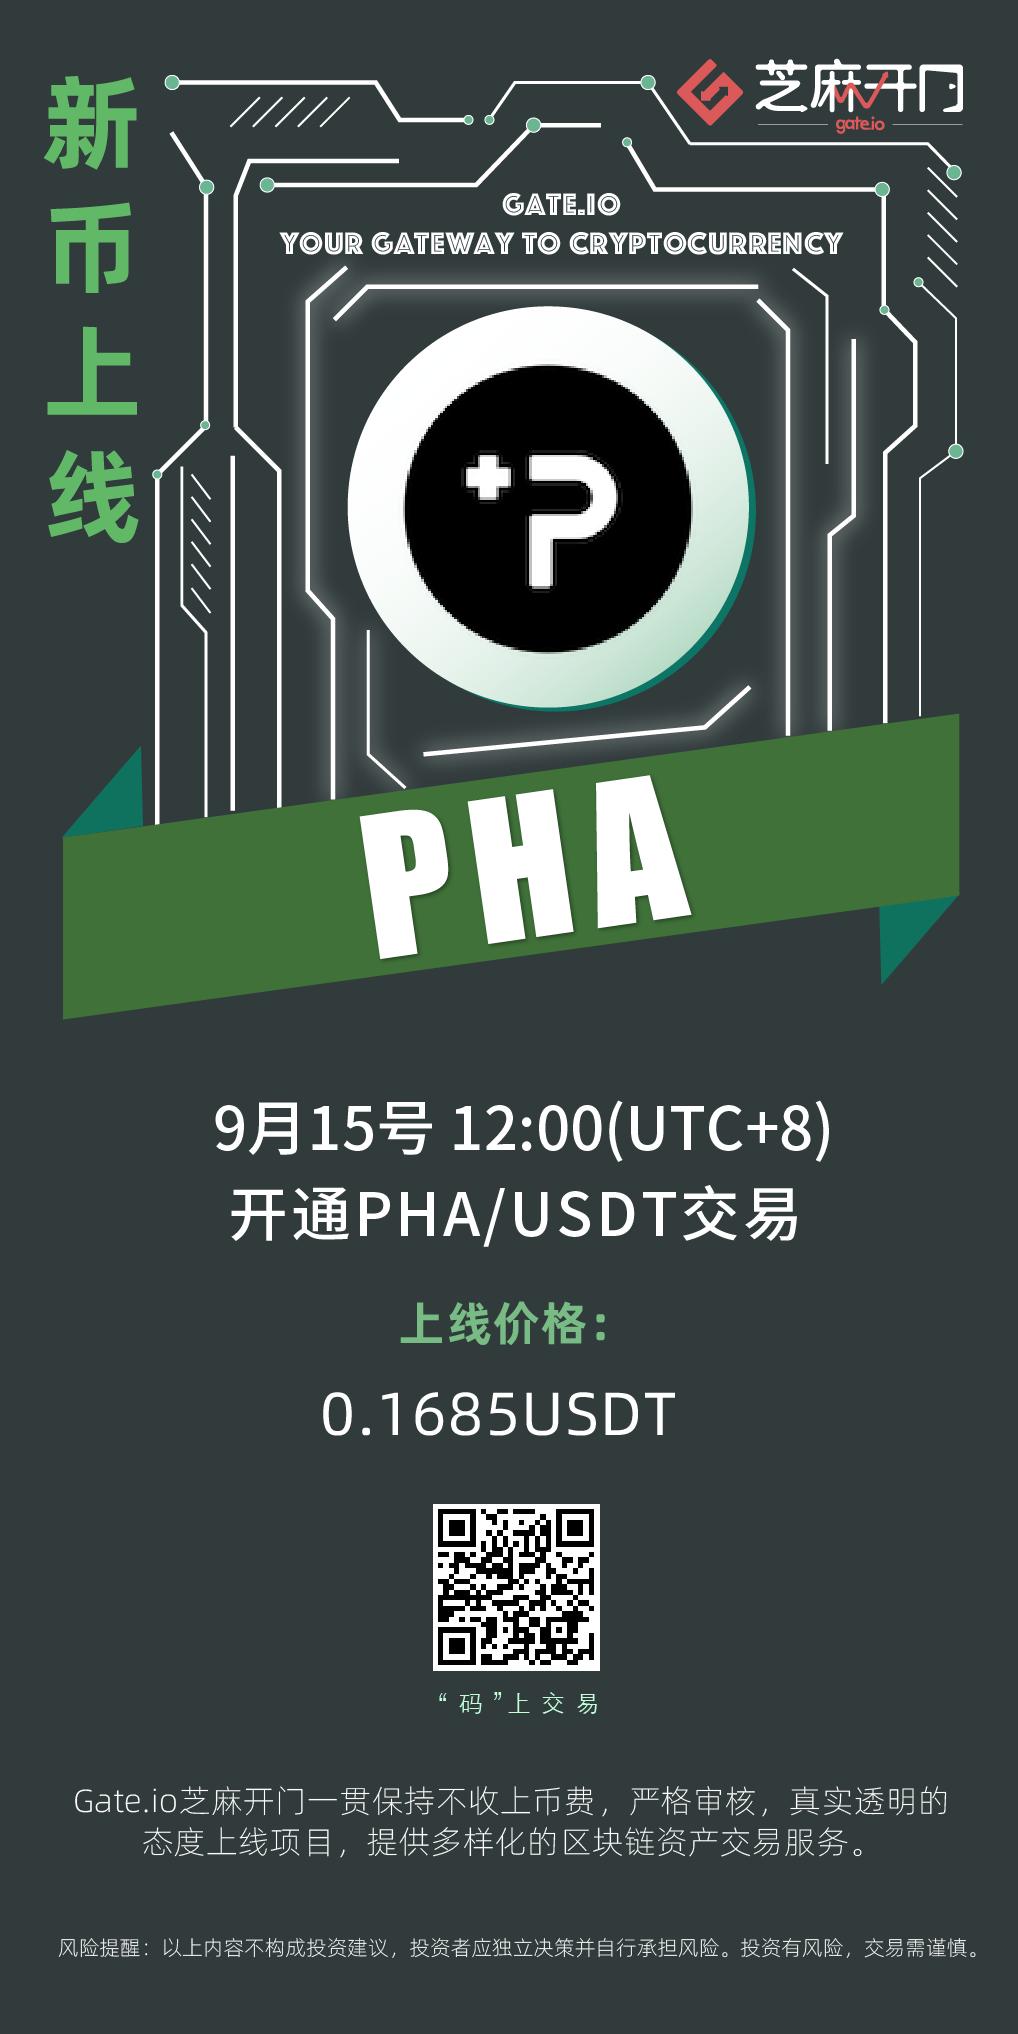 Gate.io芝麻开门 关于完成投票和上线Phala Network (PHA)交易的公告